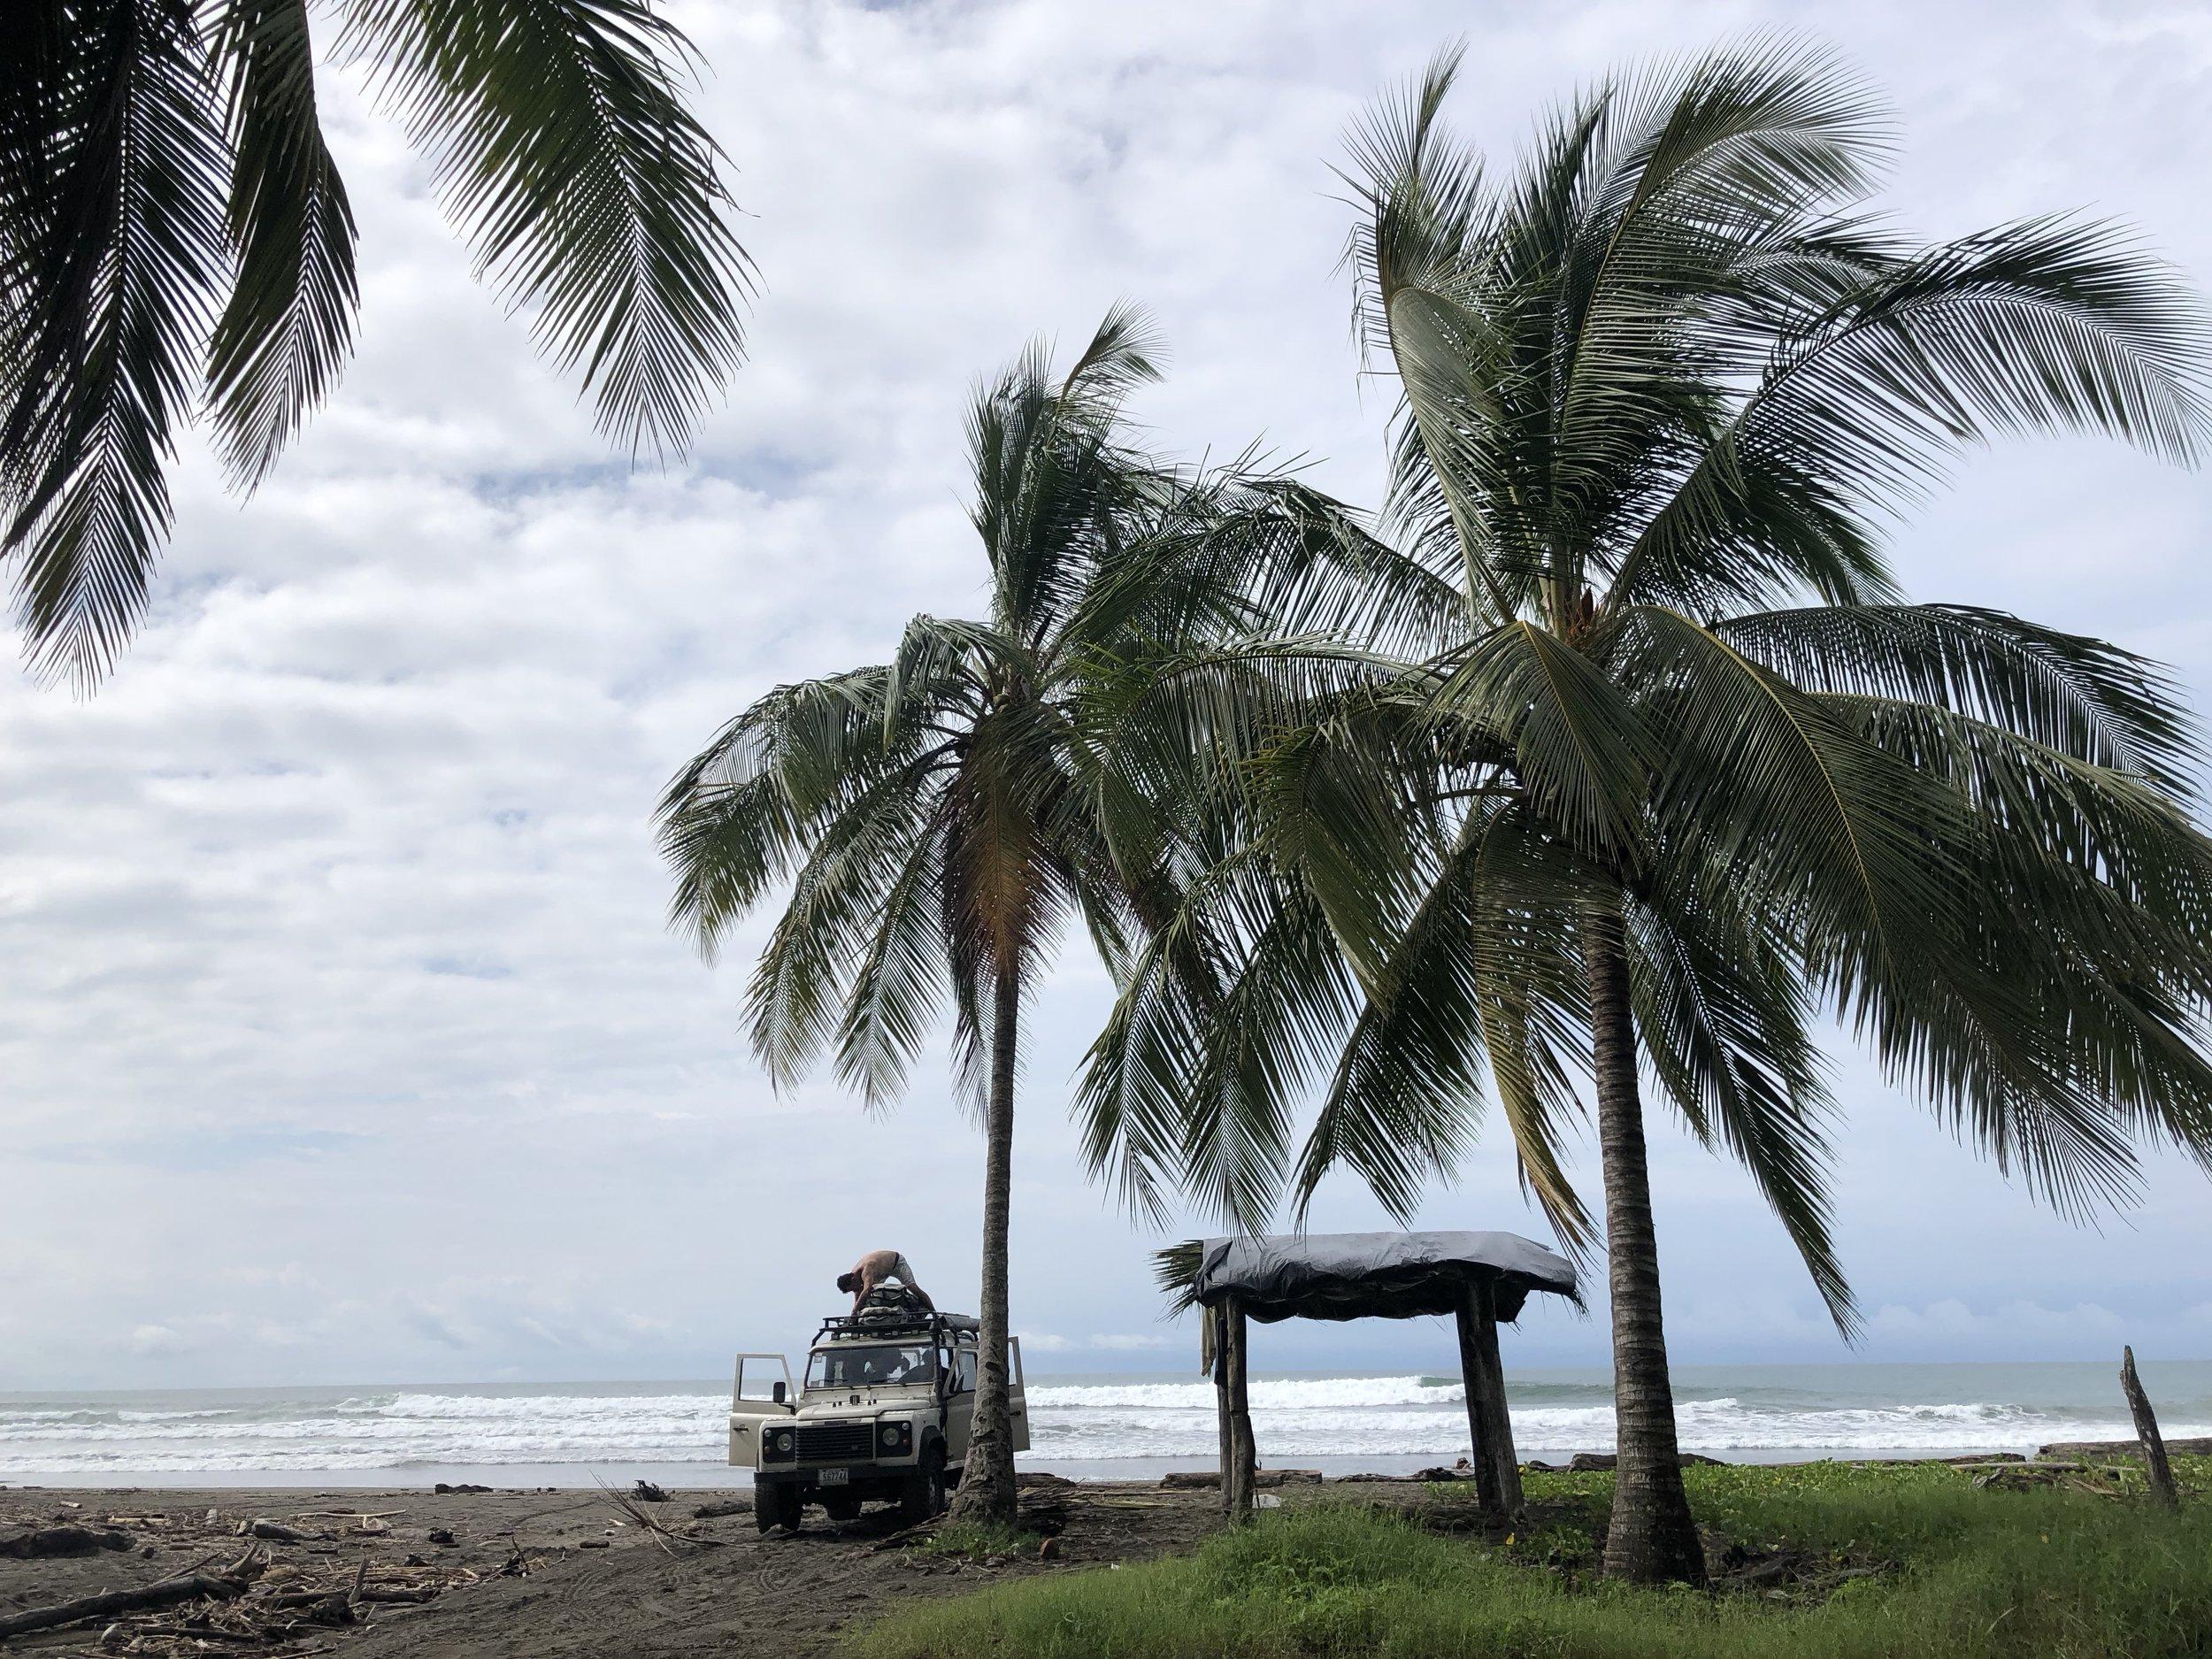 Playa Bejuco, Puentarenas Province, Costa RIca